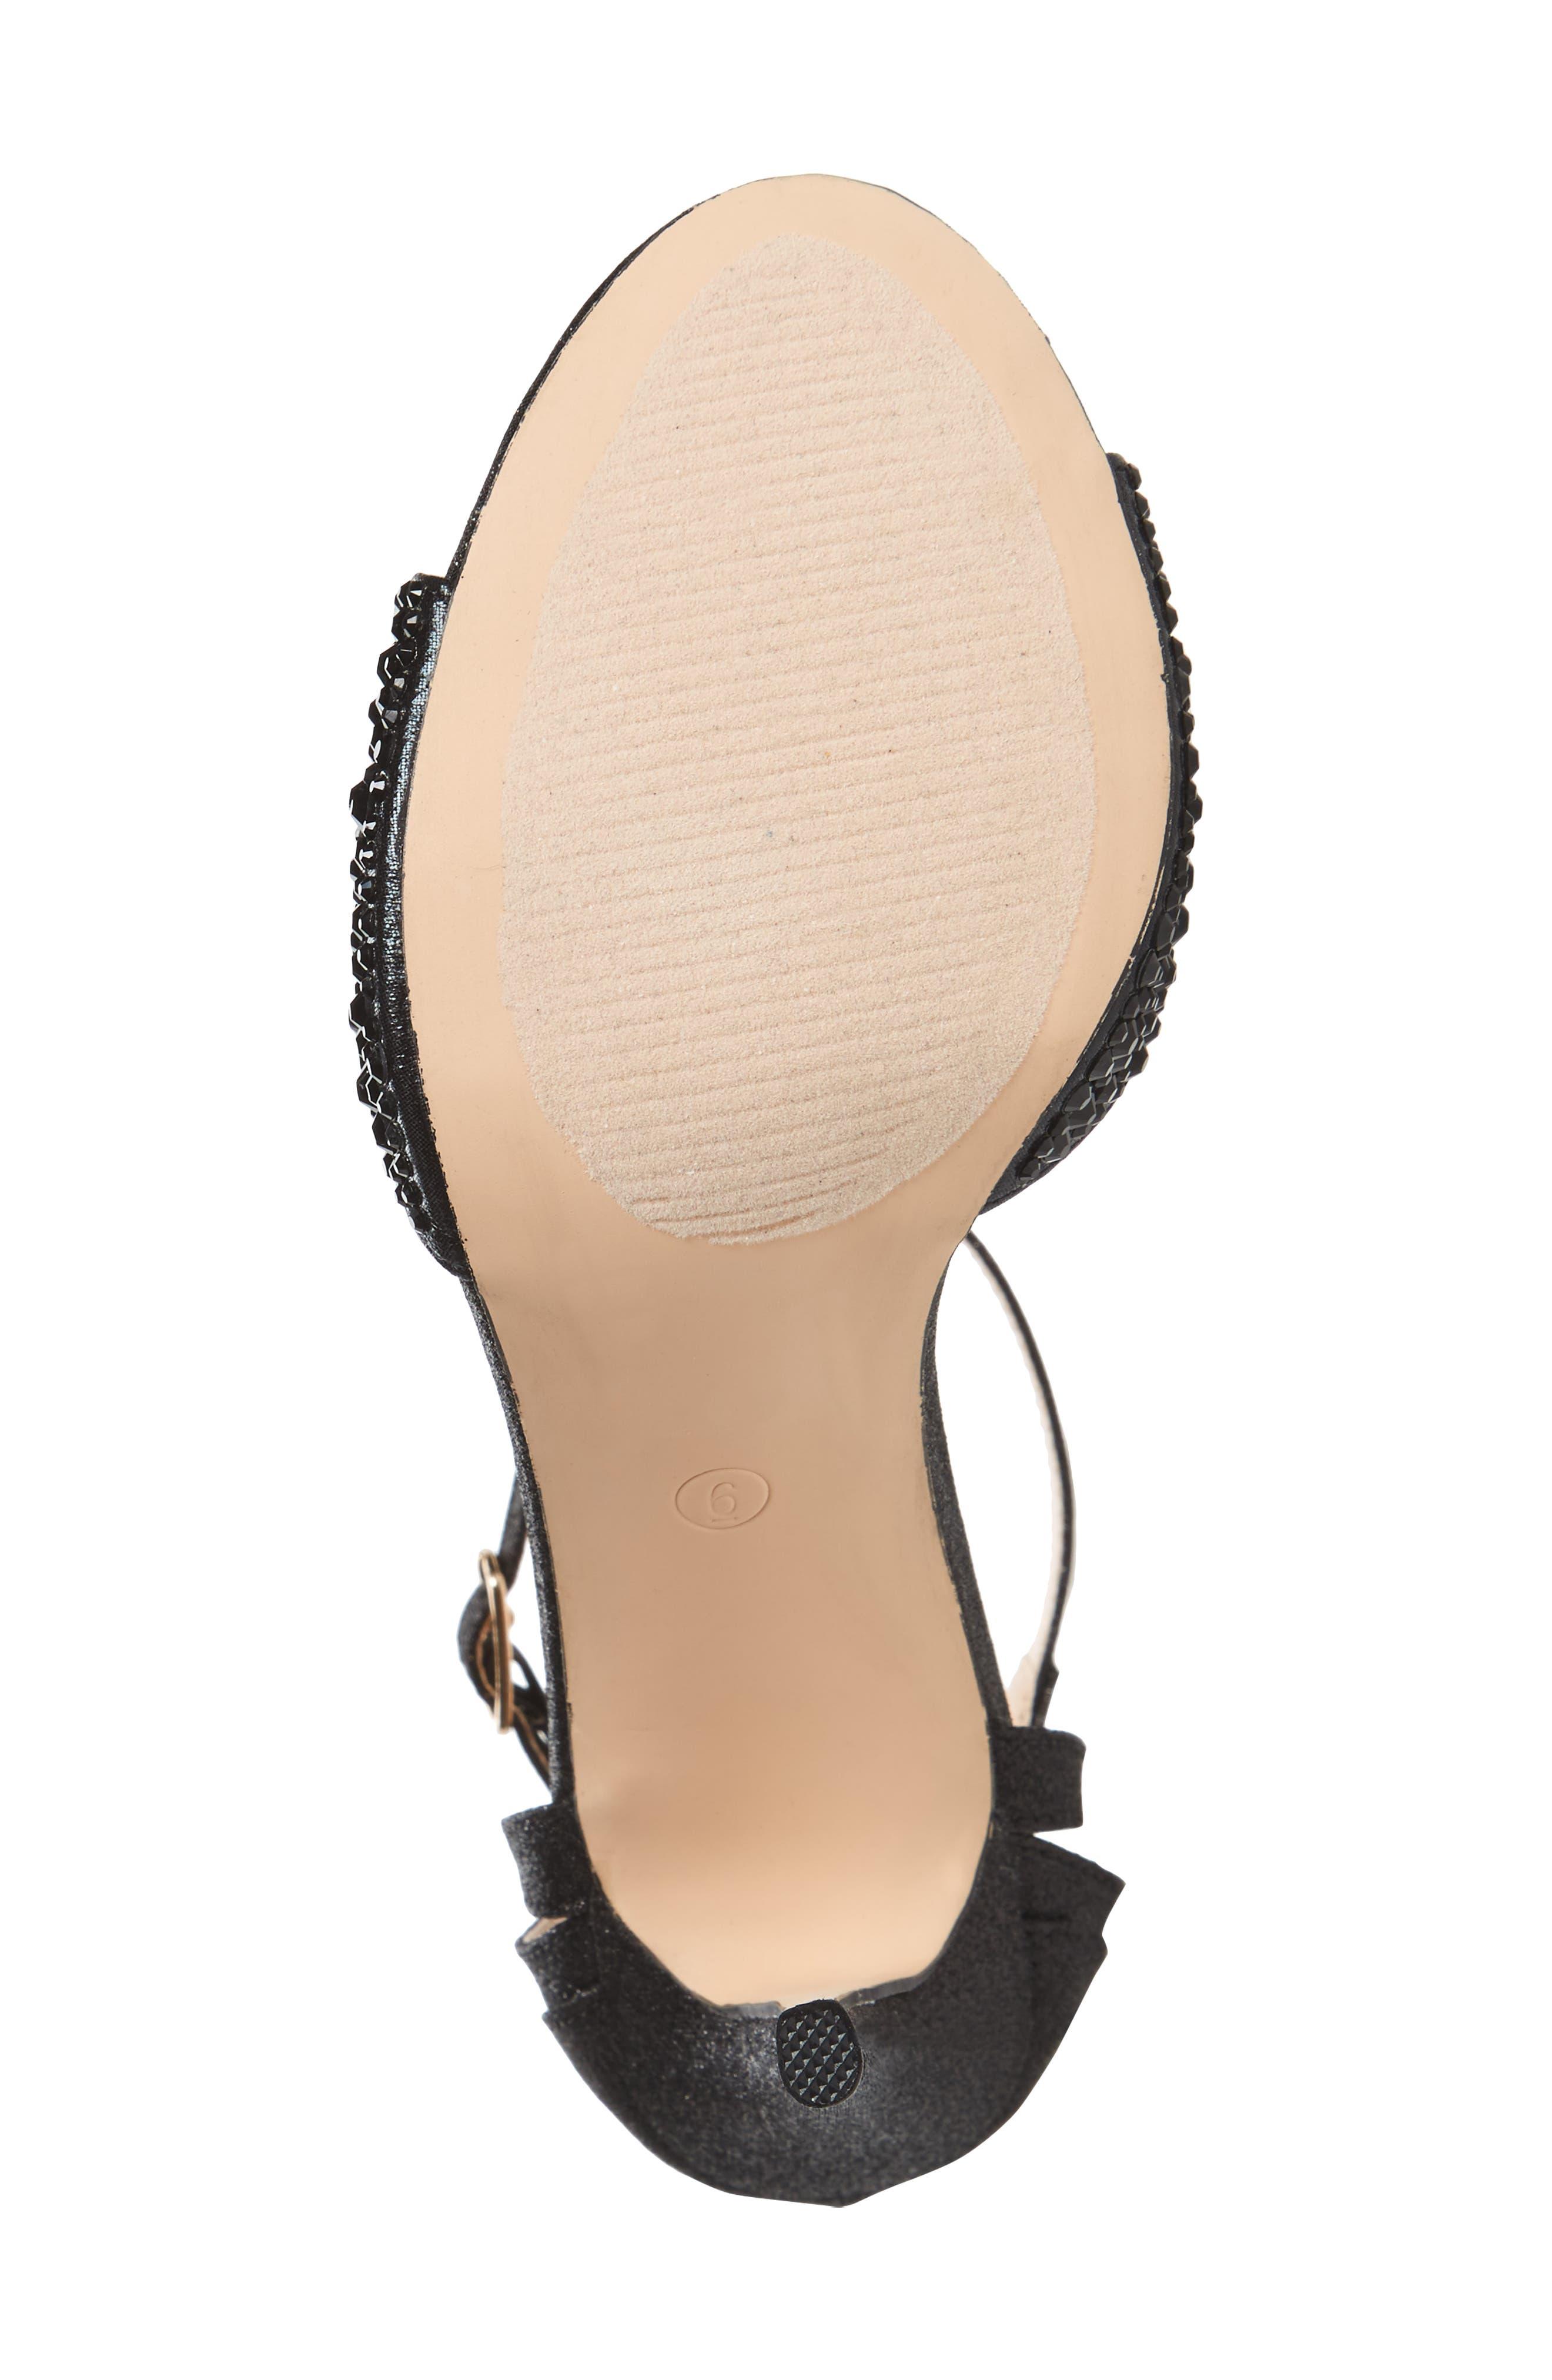 Maddy Embellished Sandal,                             Alternate thumbnail 6, color,                             001